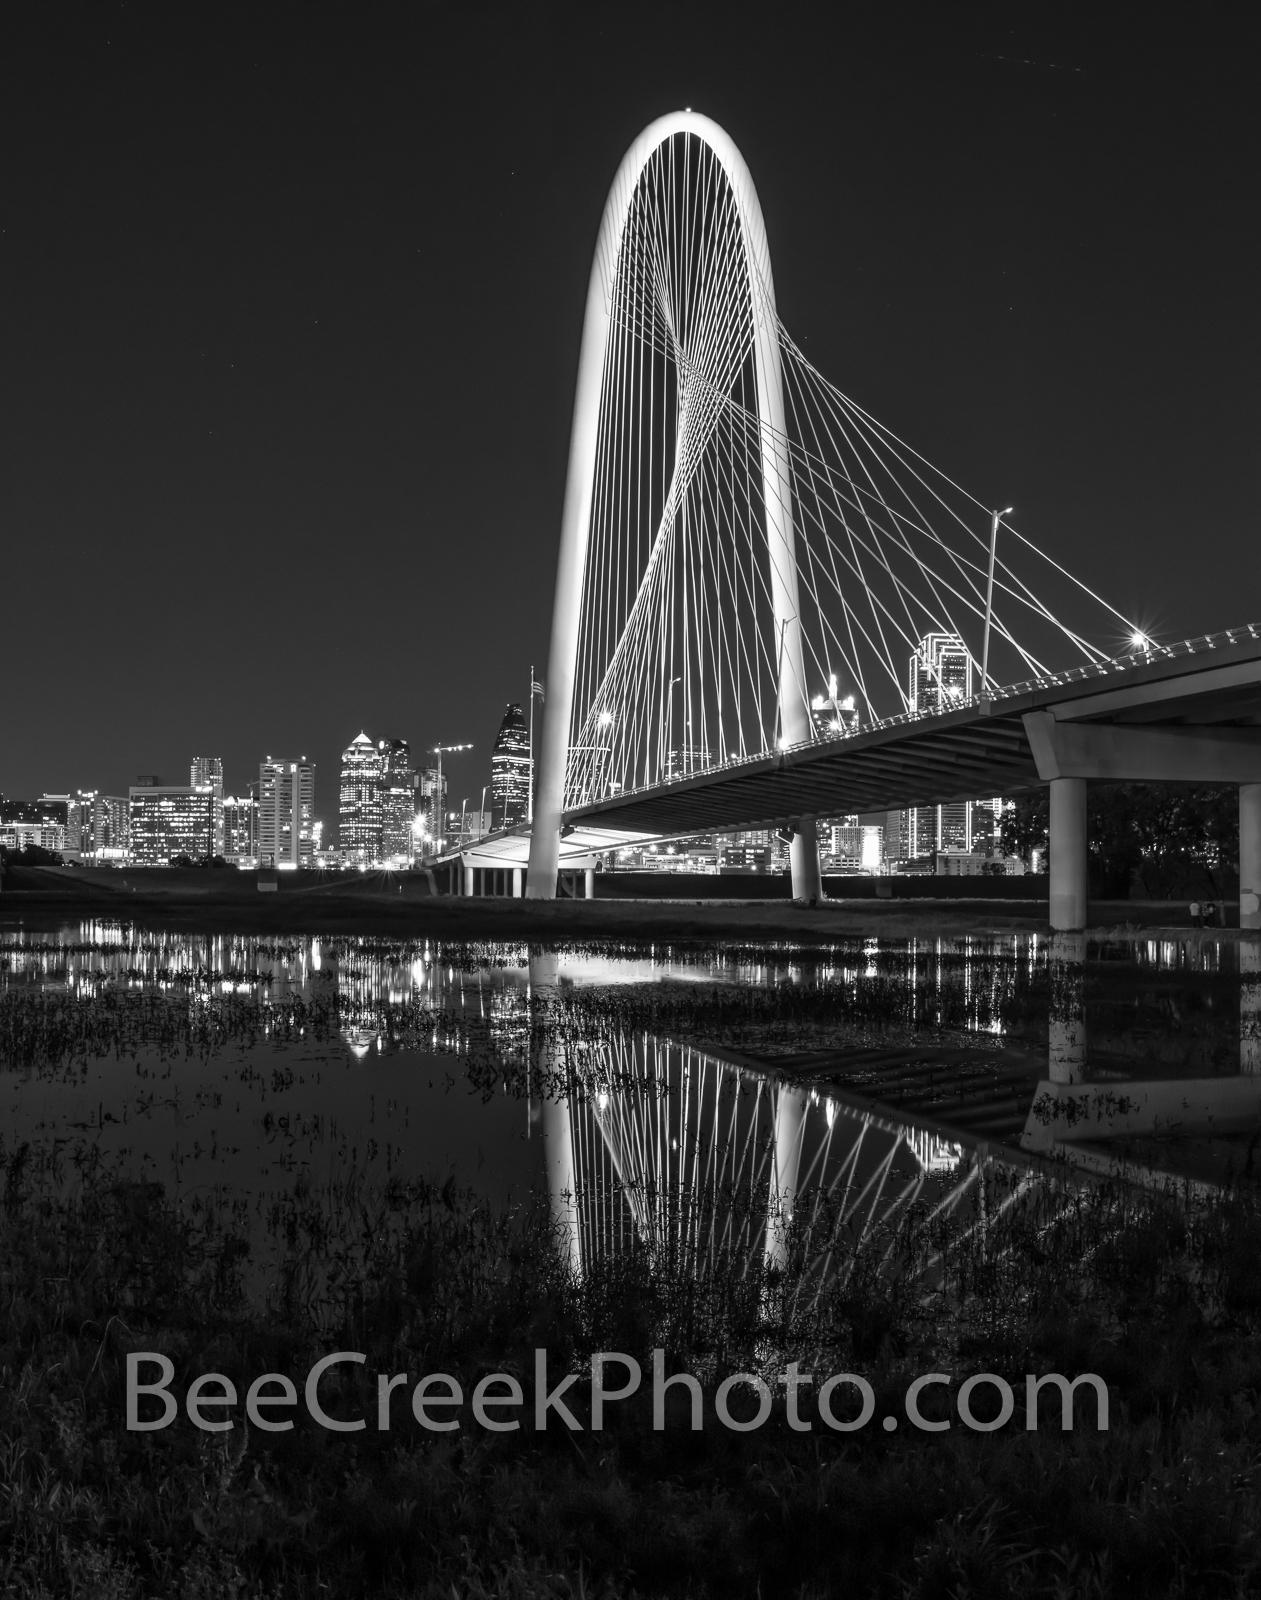 Dallas Margaret Hunt Hill Bridge Night B W109 - Inthis verticalcapture of the Margaret Hunt Hill Bridge at...